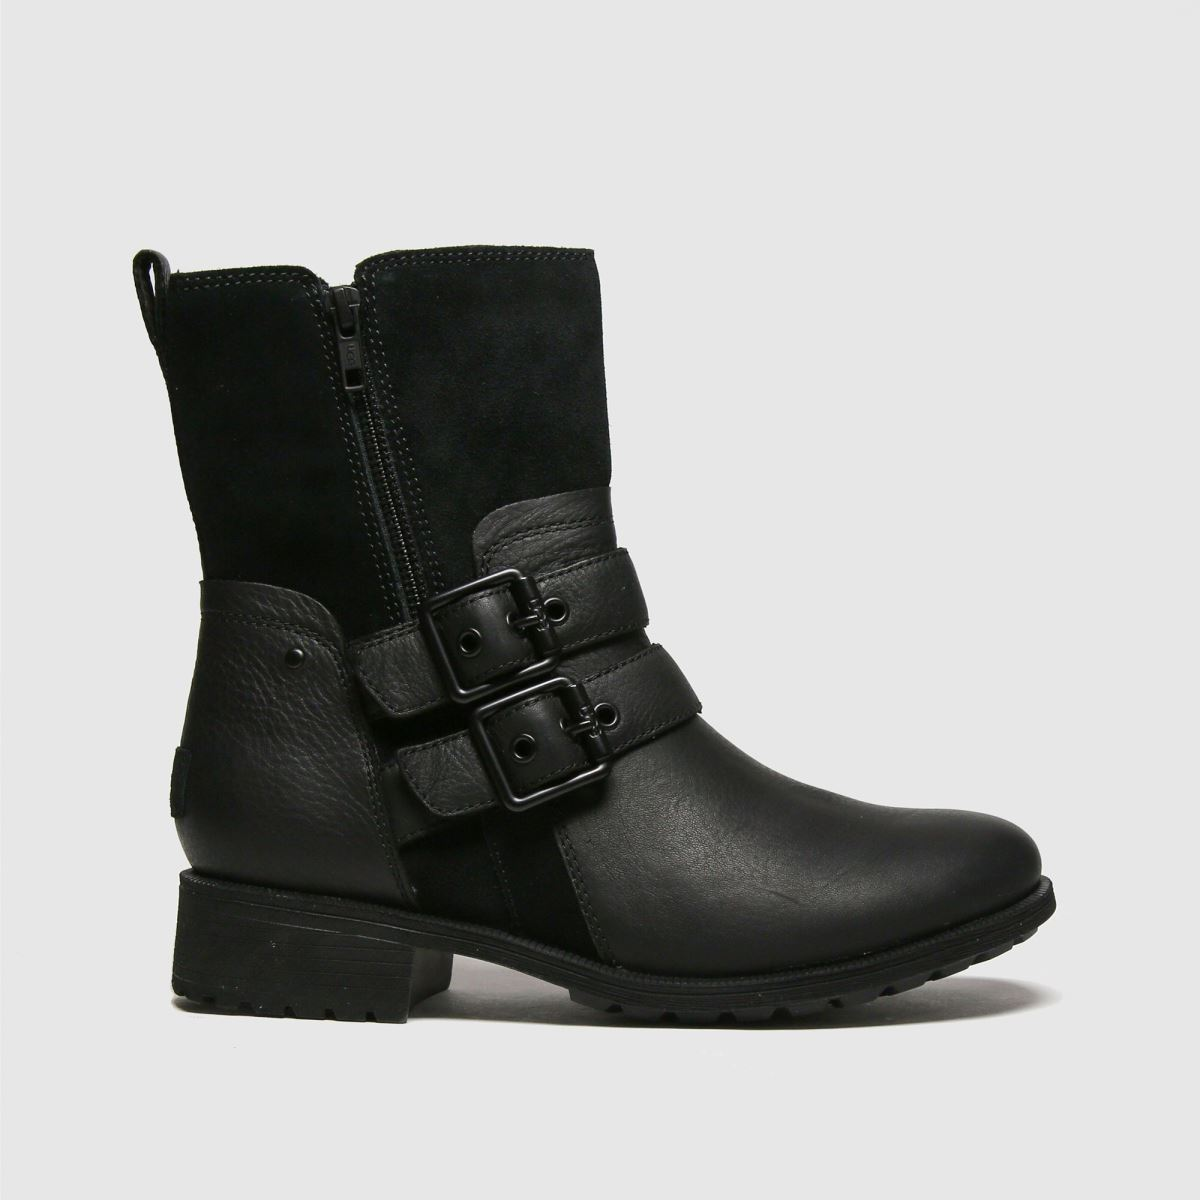 Ugg Black Wilde Boots